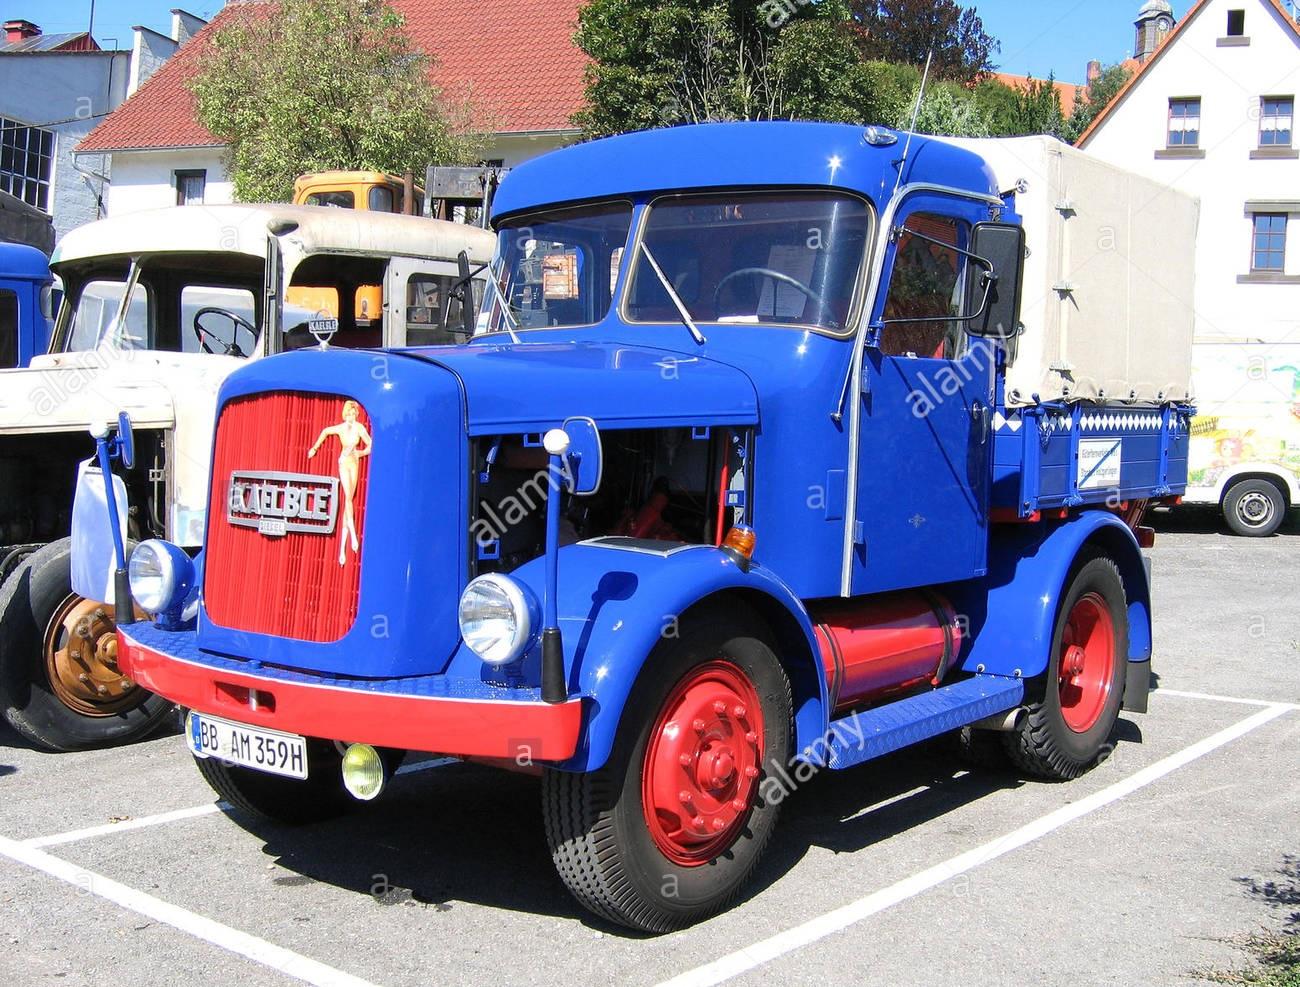 kaelble-k-415